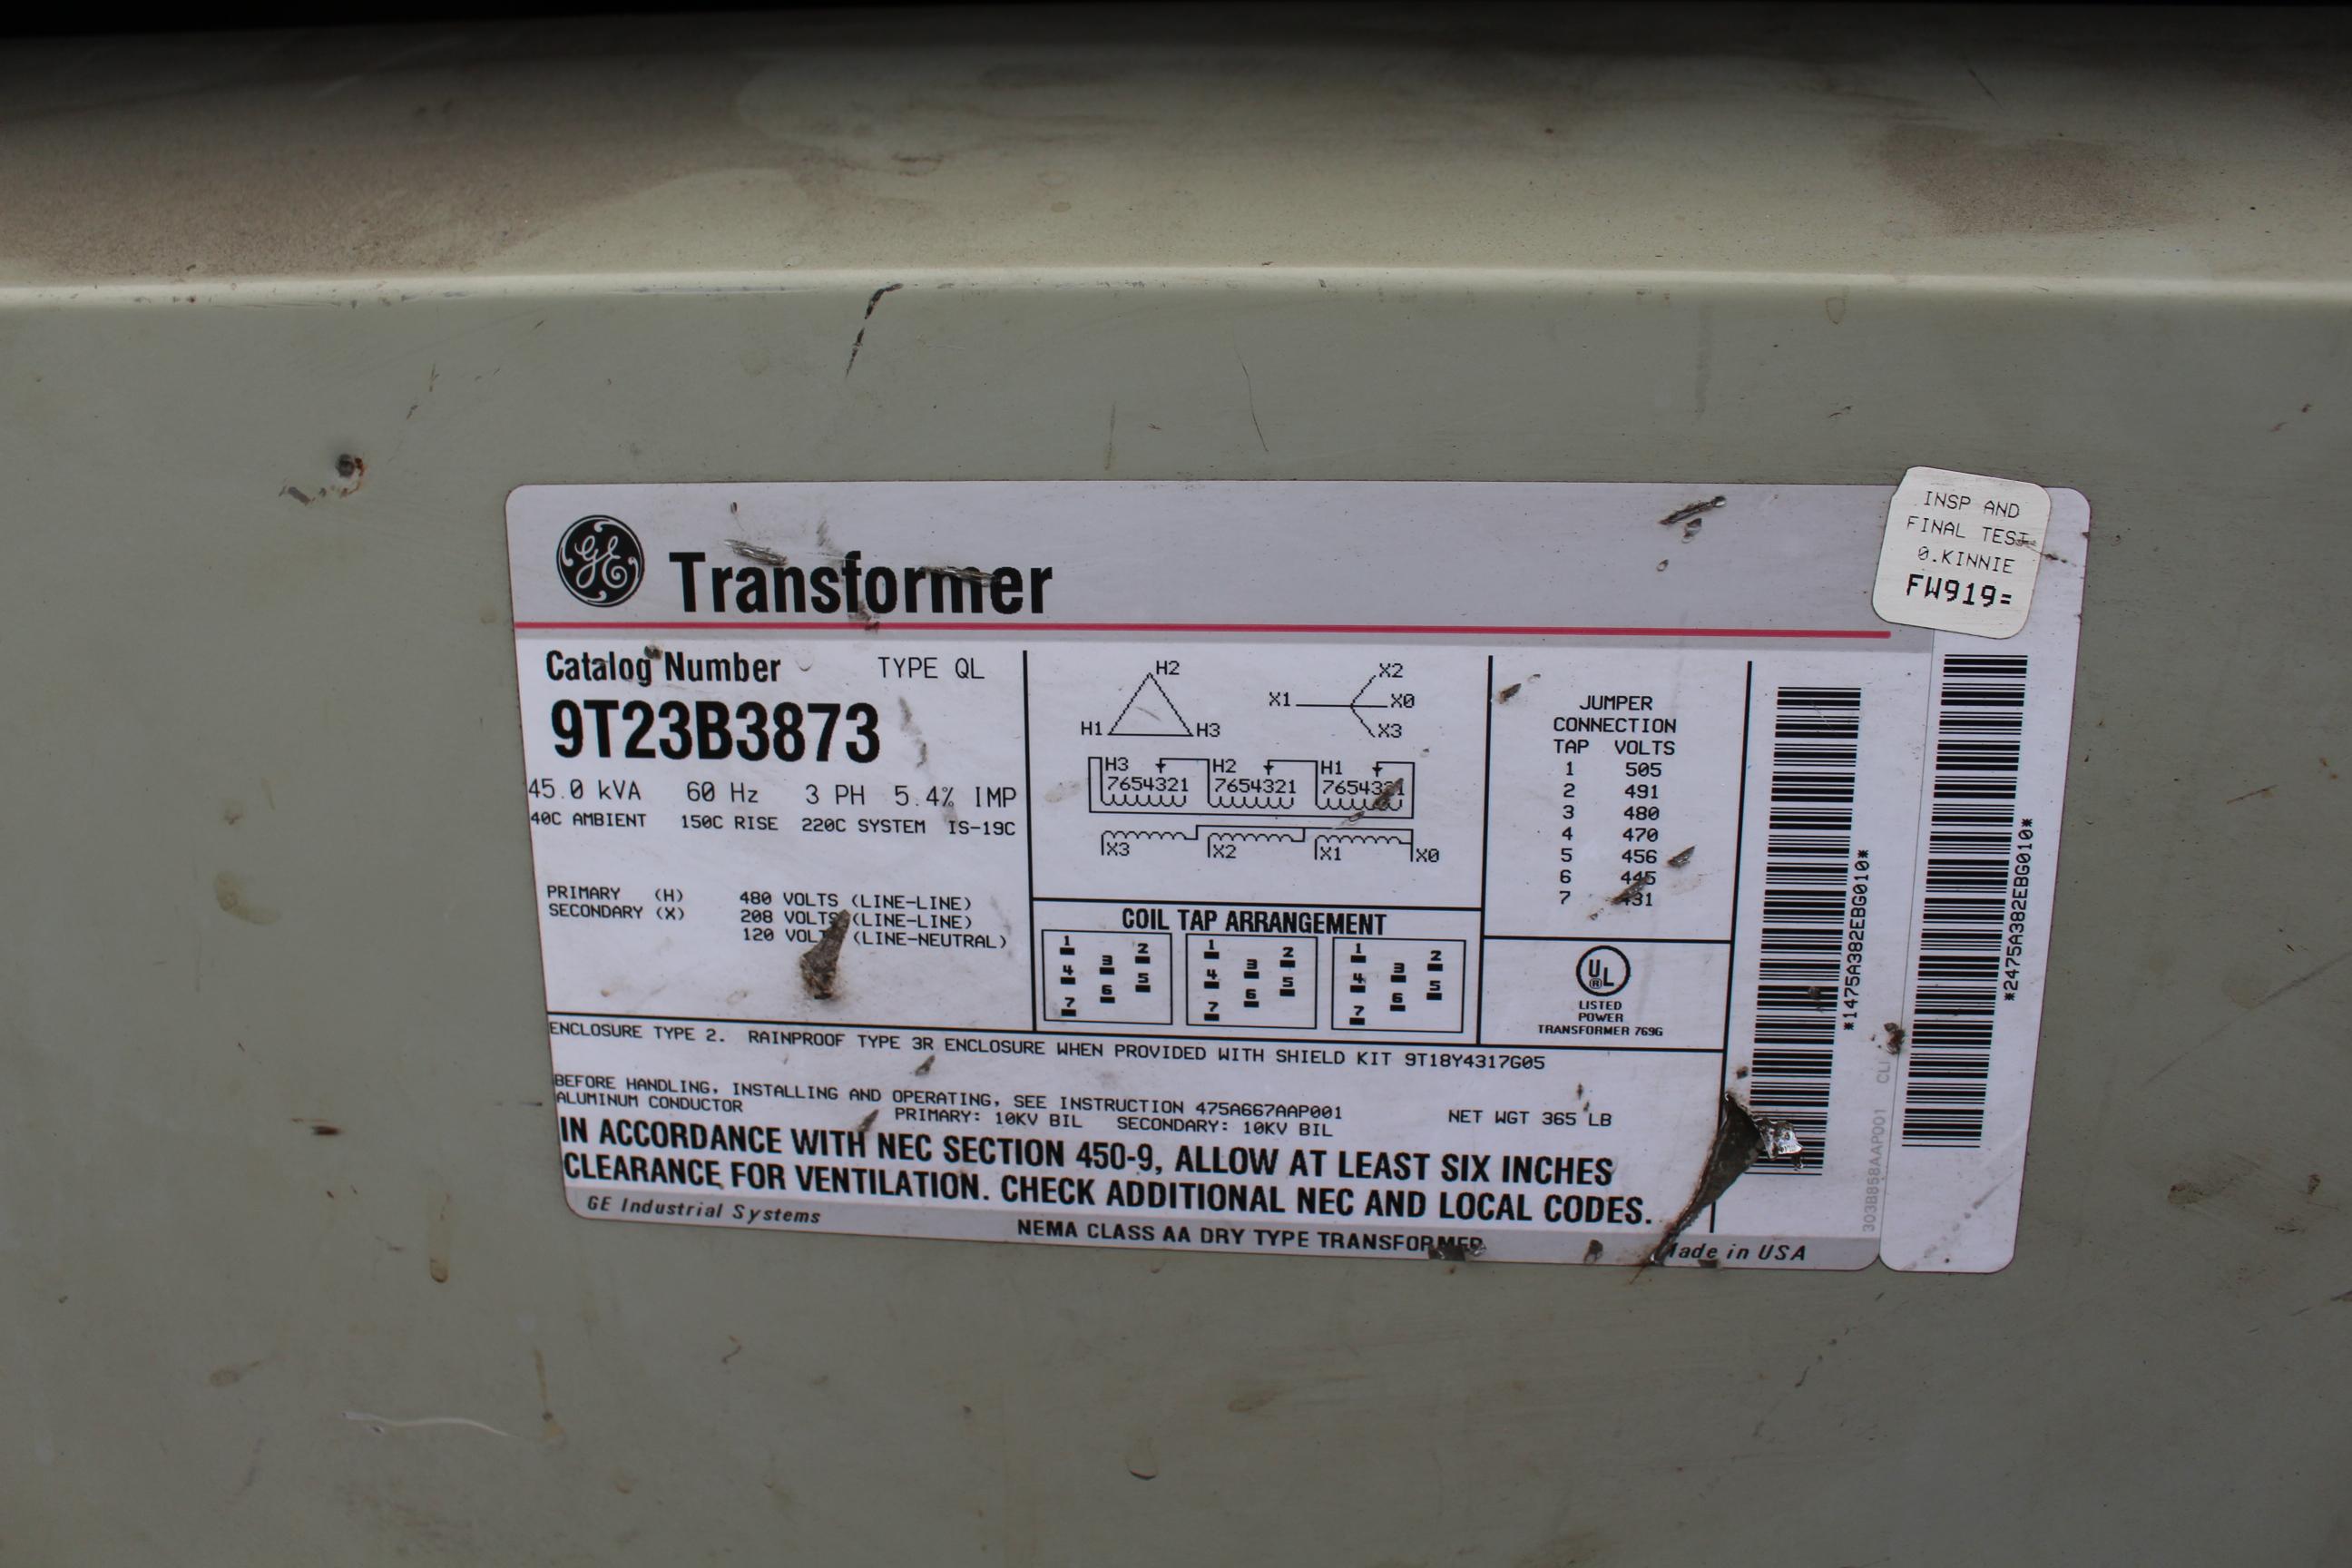 Lot 63 - GE TRANSFORMER, 45 KVA